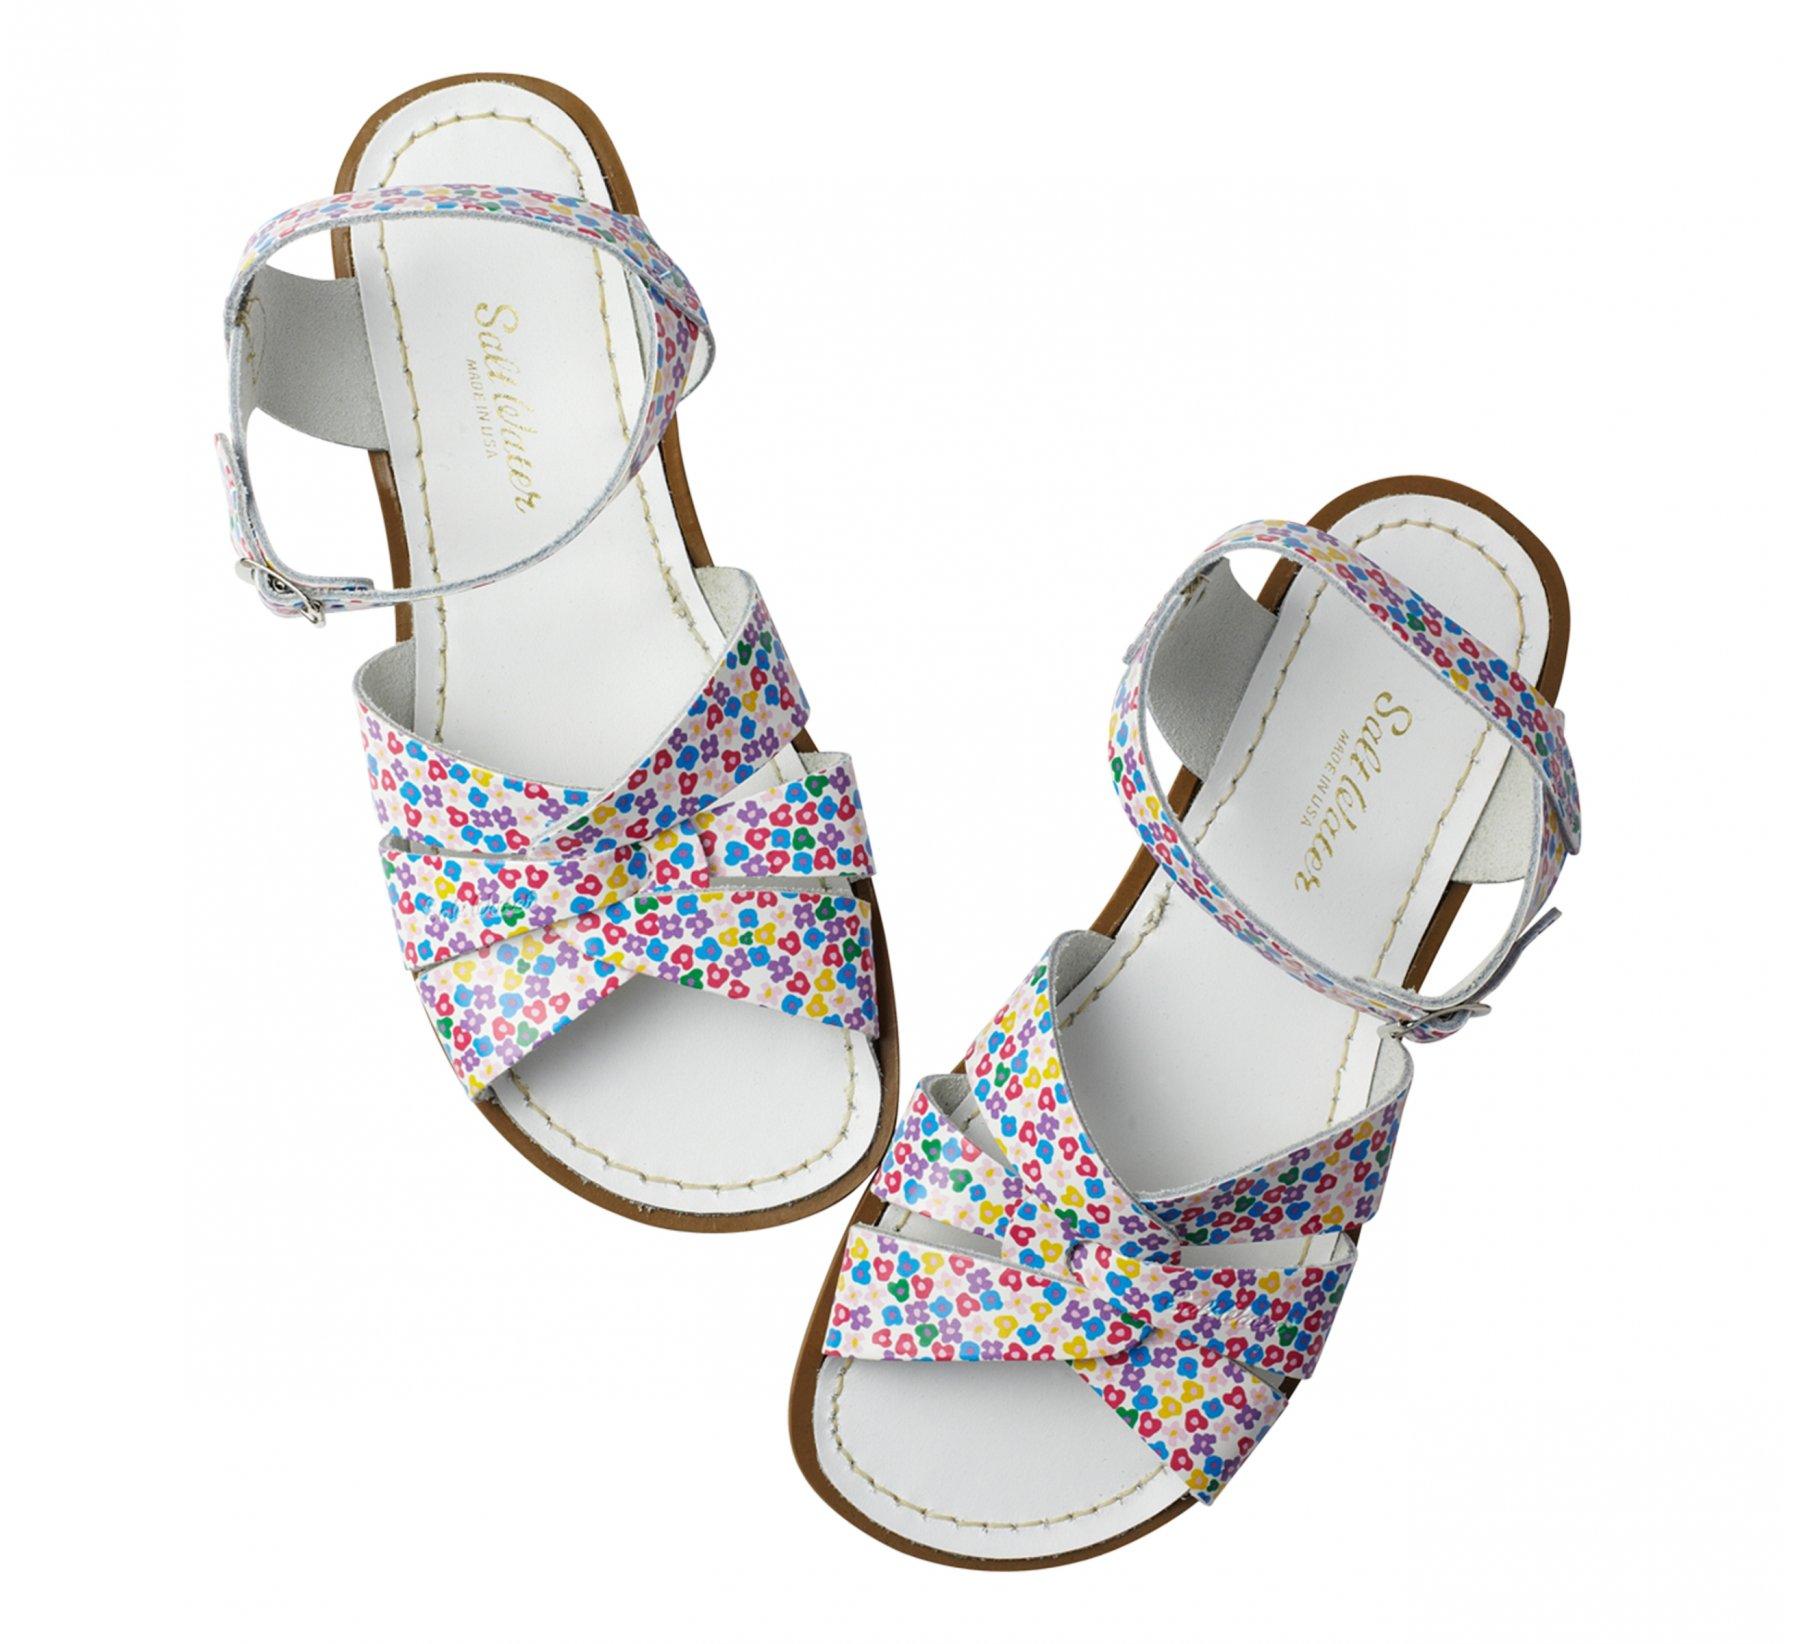 Original Floral  - Salt Water Sandals